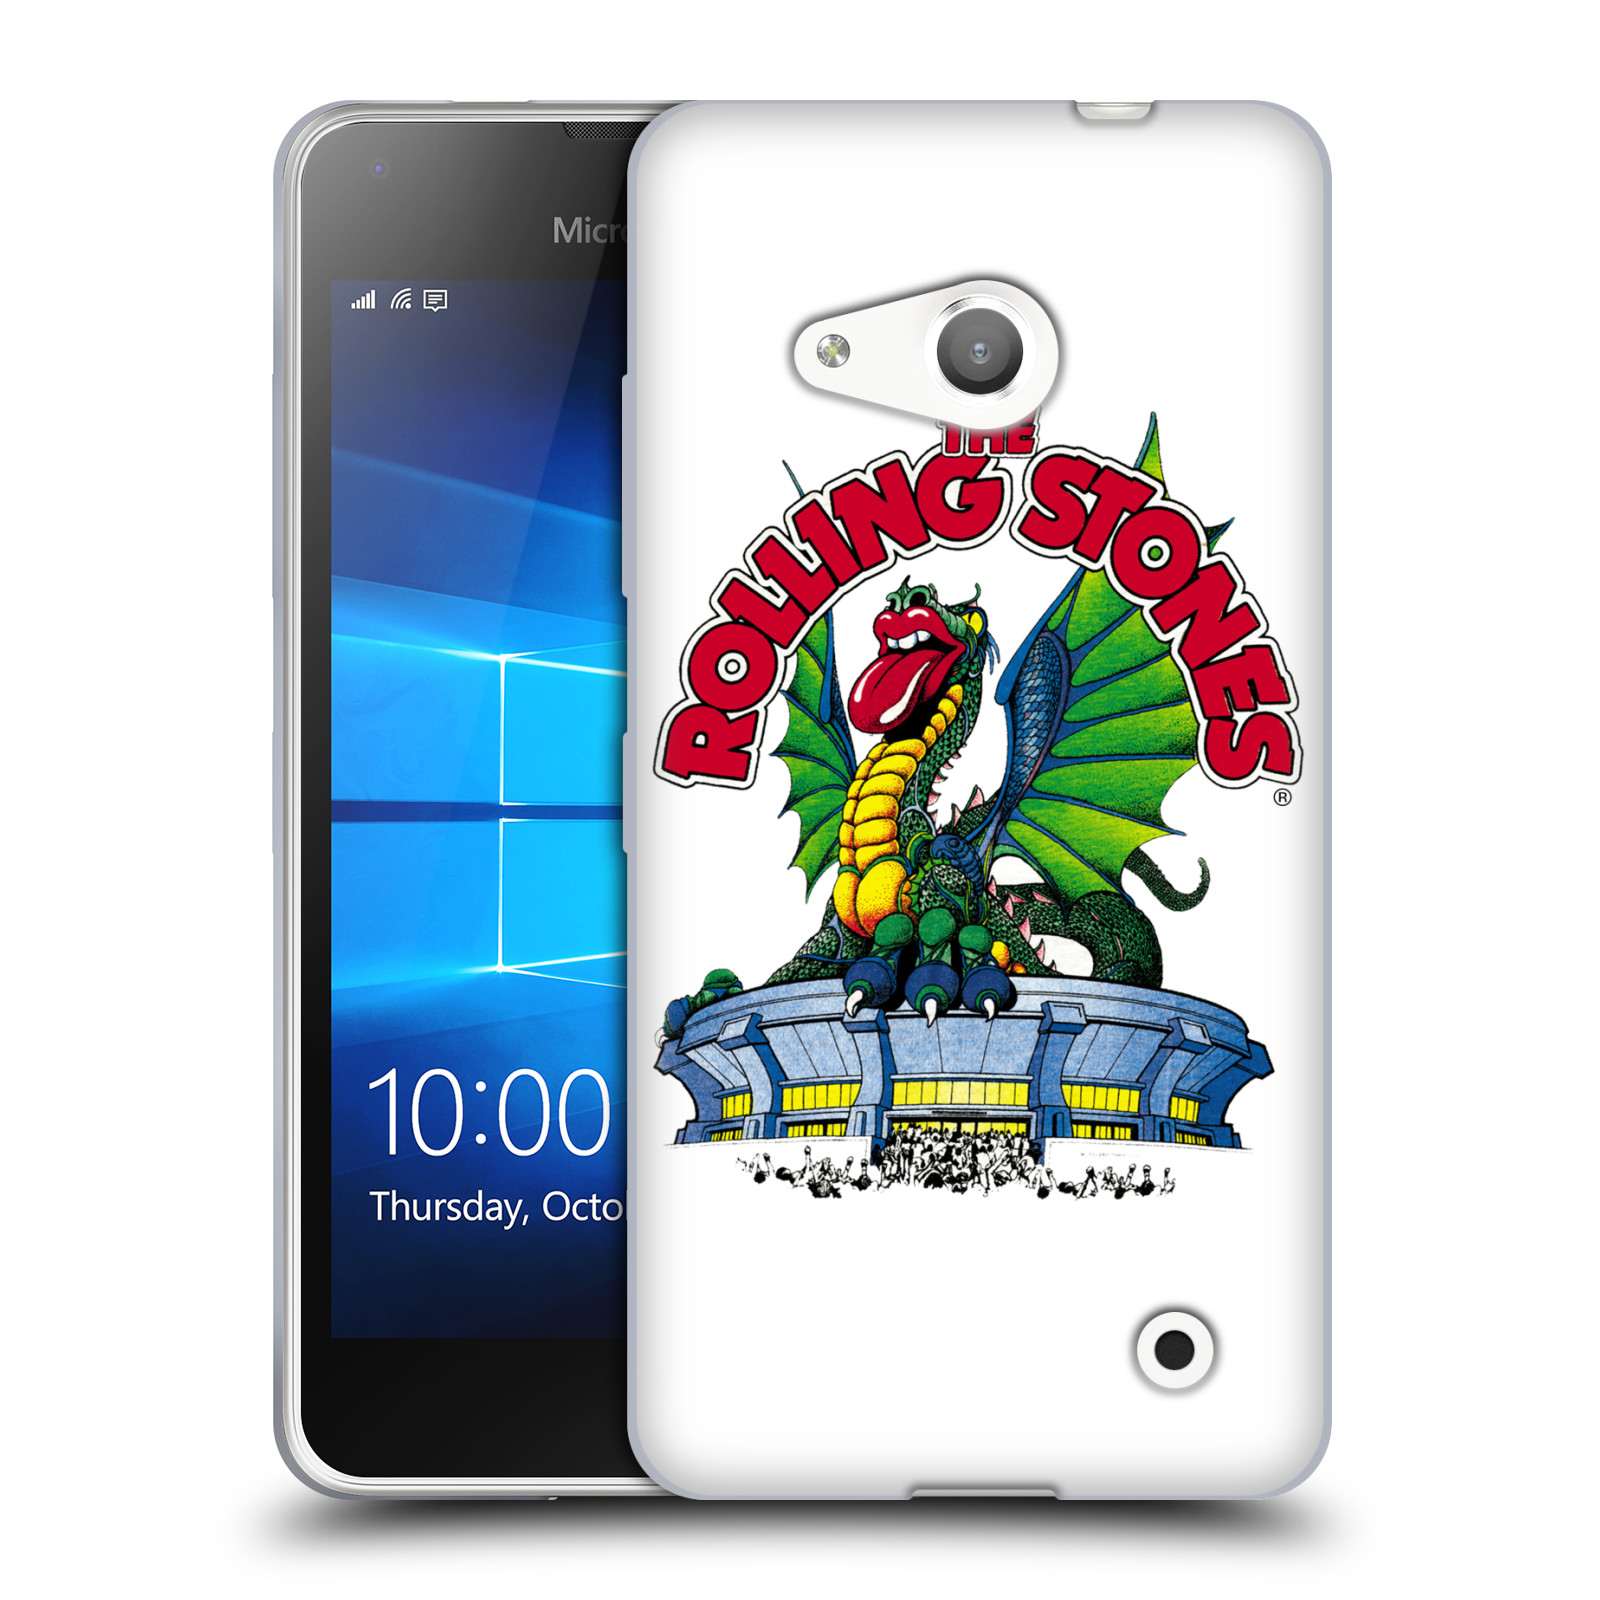 Silikonové pouzdro na mobil Microsoft Lumia 550 HEAD CASE The Rolling Stones – Dragon (Silikonový kryt či obal The Rolling Stones Official na mobilní telefon Microsoft Lumia 550)